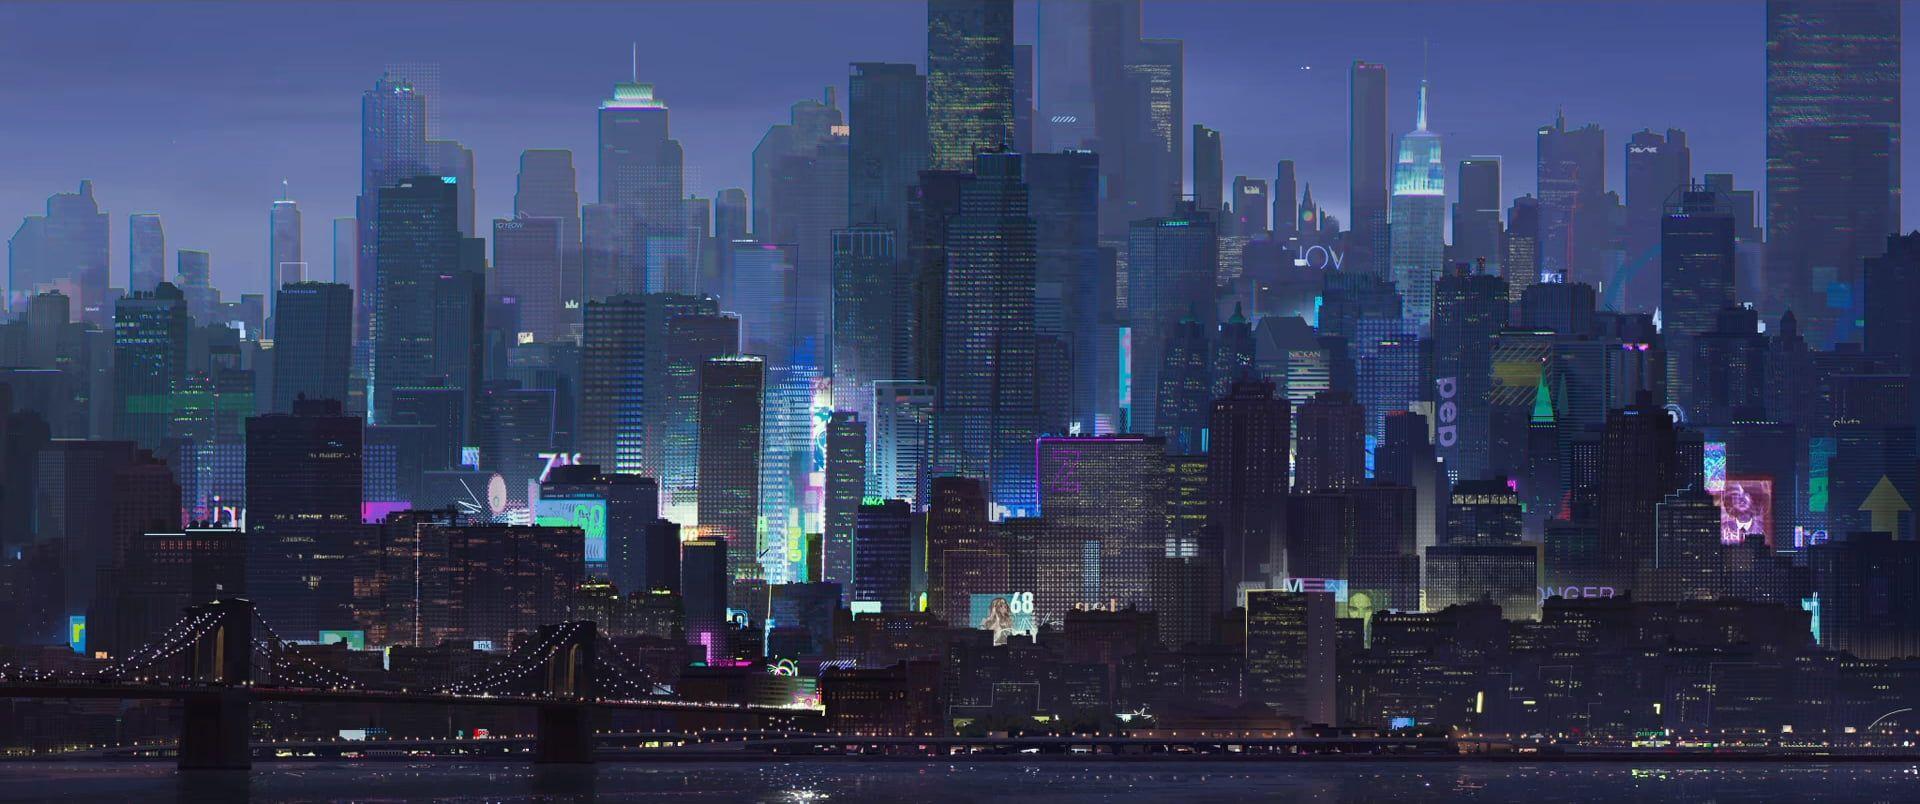 City Landscape Cityscape Artwork Spider Man Blue 1080p Wallpaper Hdwallpaper Desktop City Landscape Concept Art World Cityscape